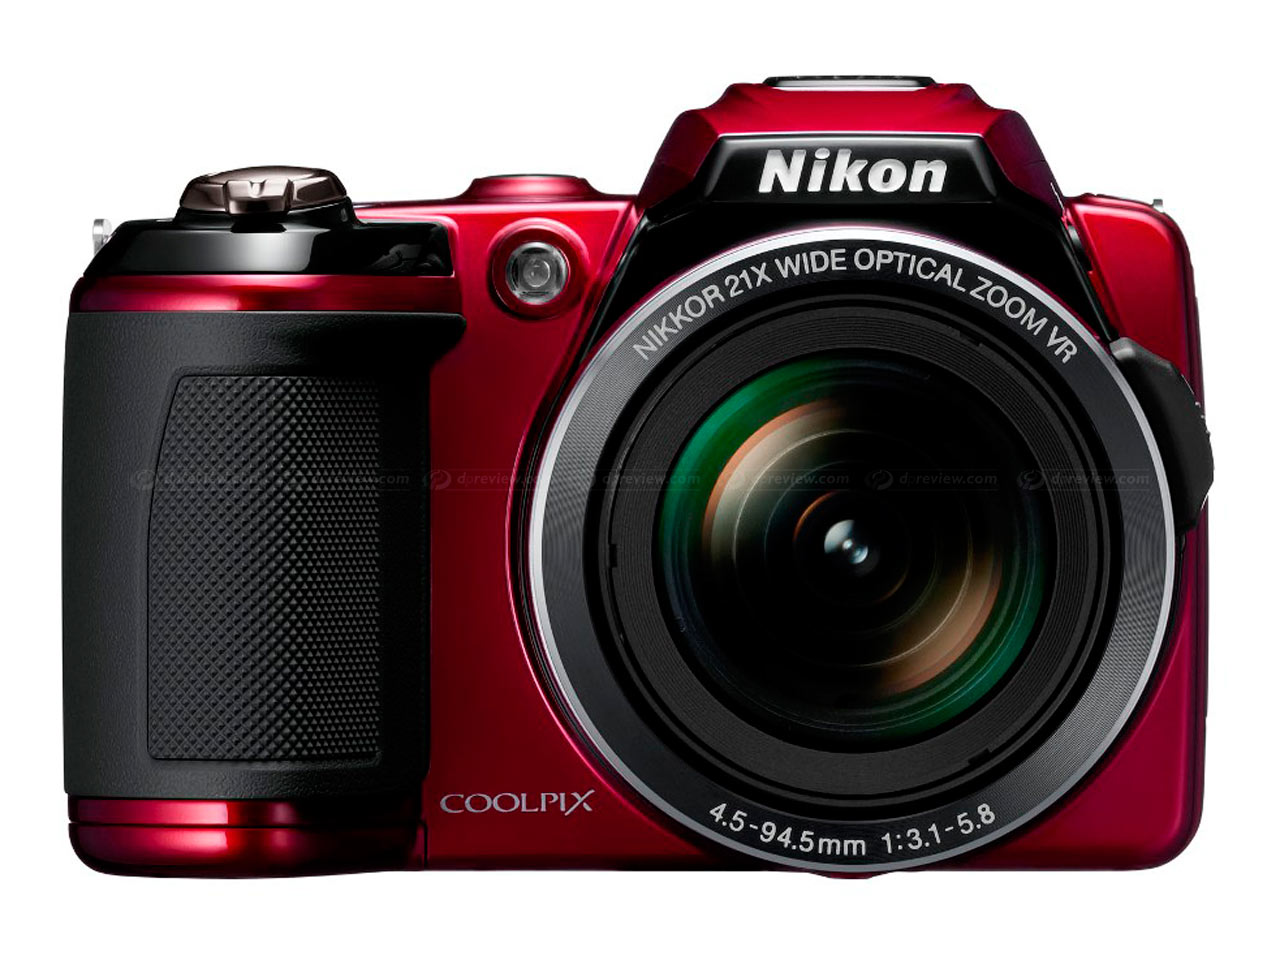 nikon introduces l120 p500 and s9100 superzooms digital rh dpreview com nikon coolpix s4100 user's manual nikon coolpix s9700 user manual